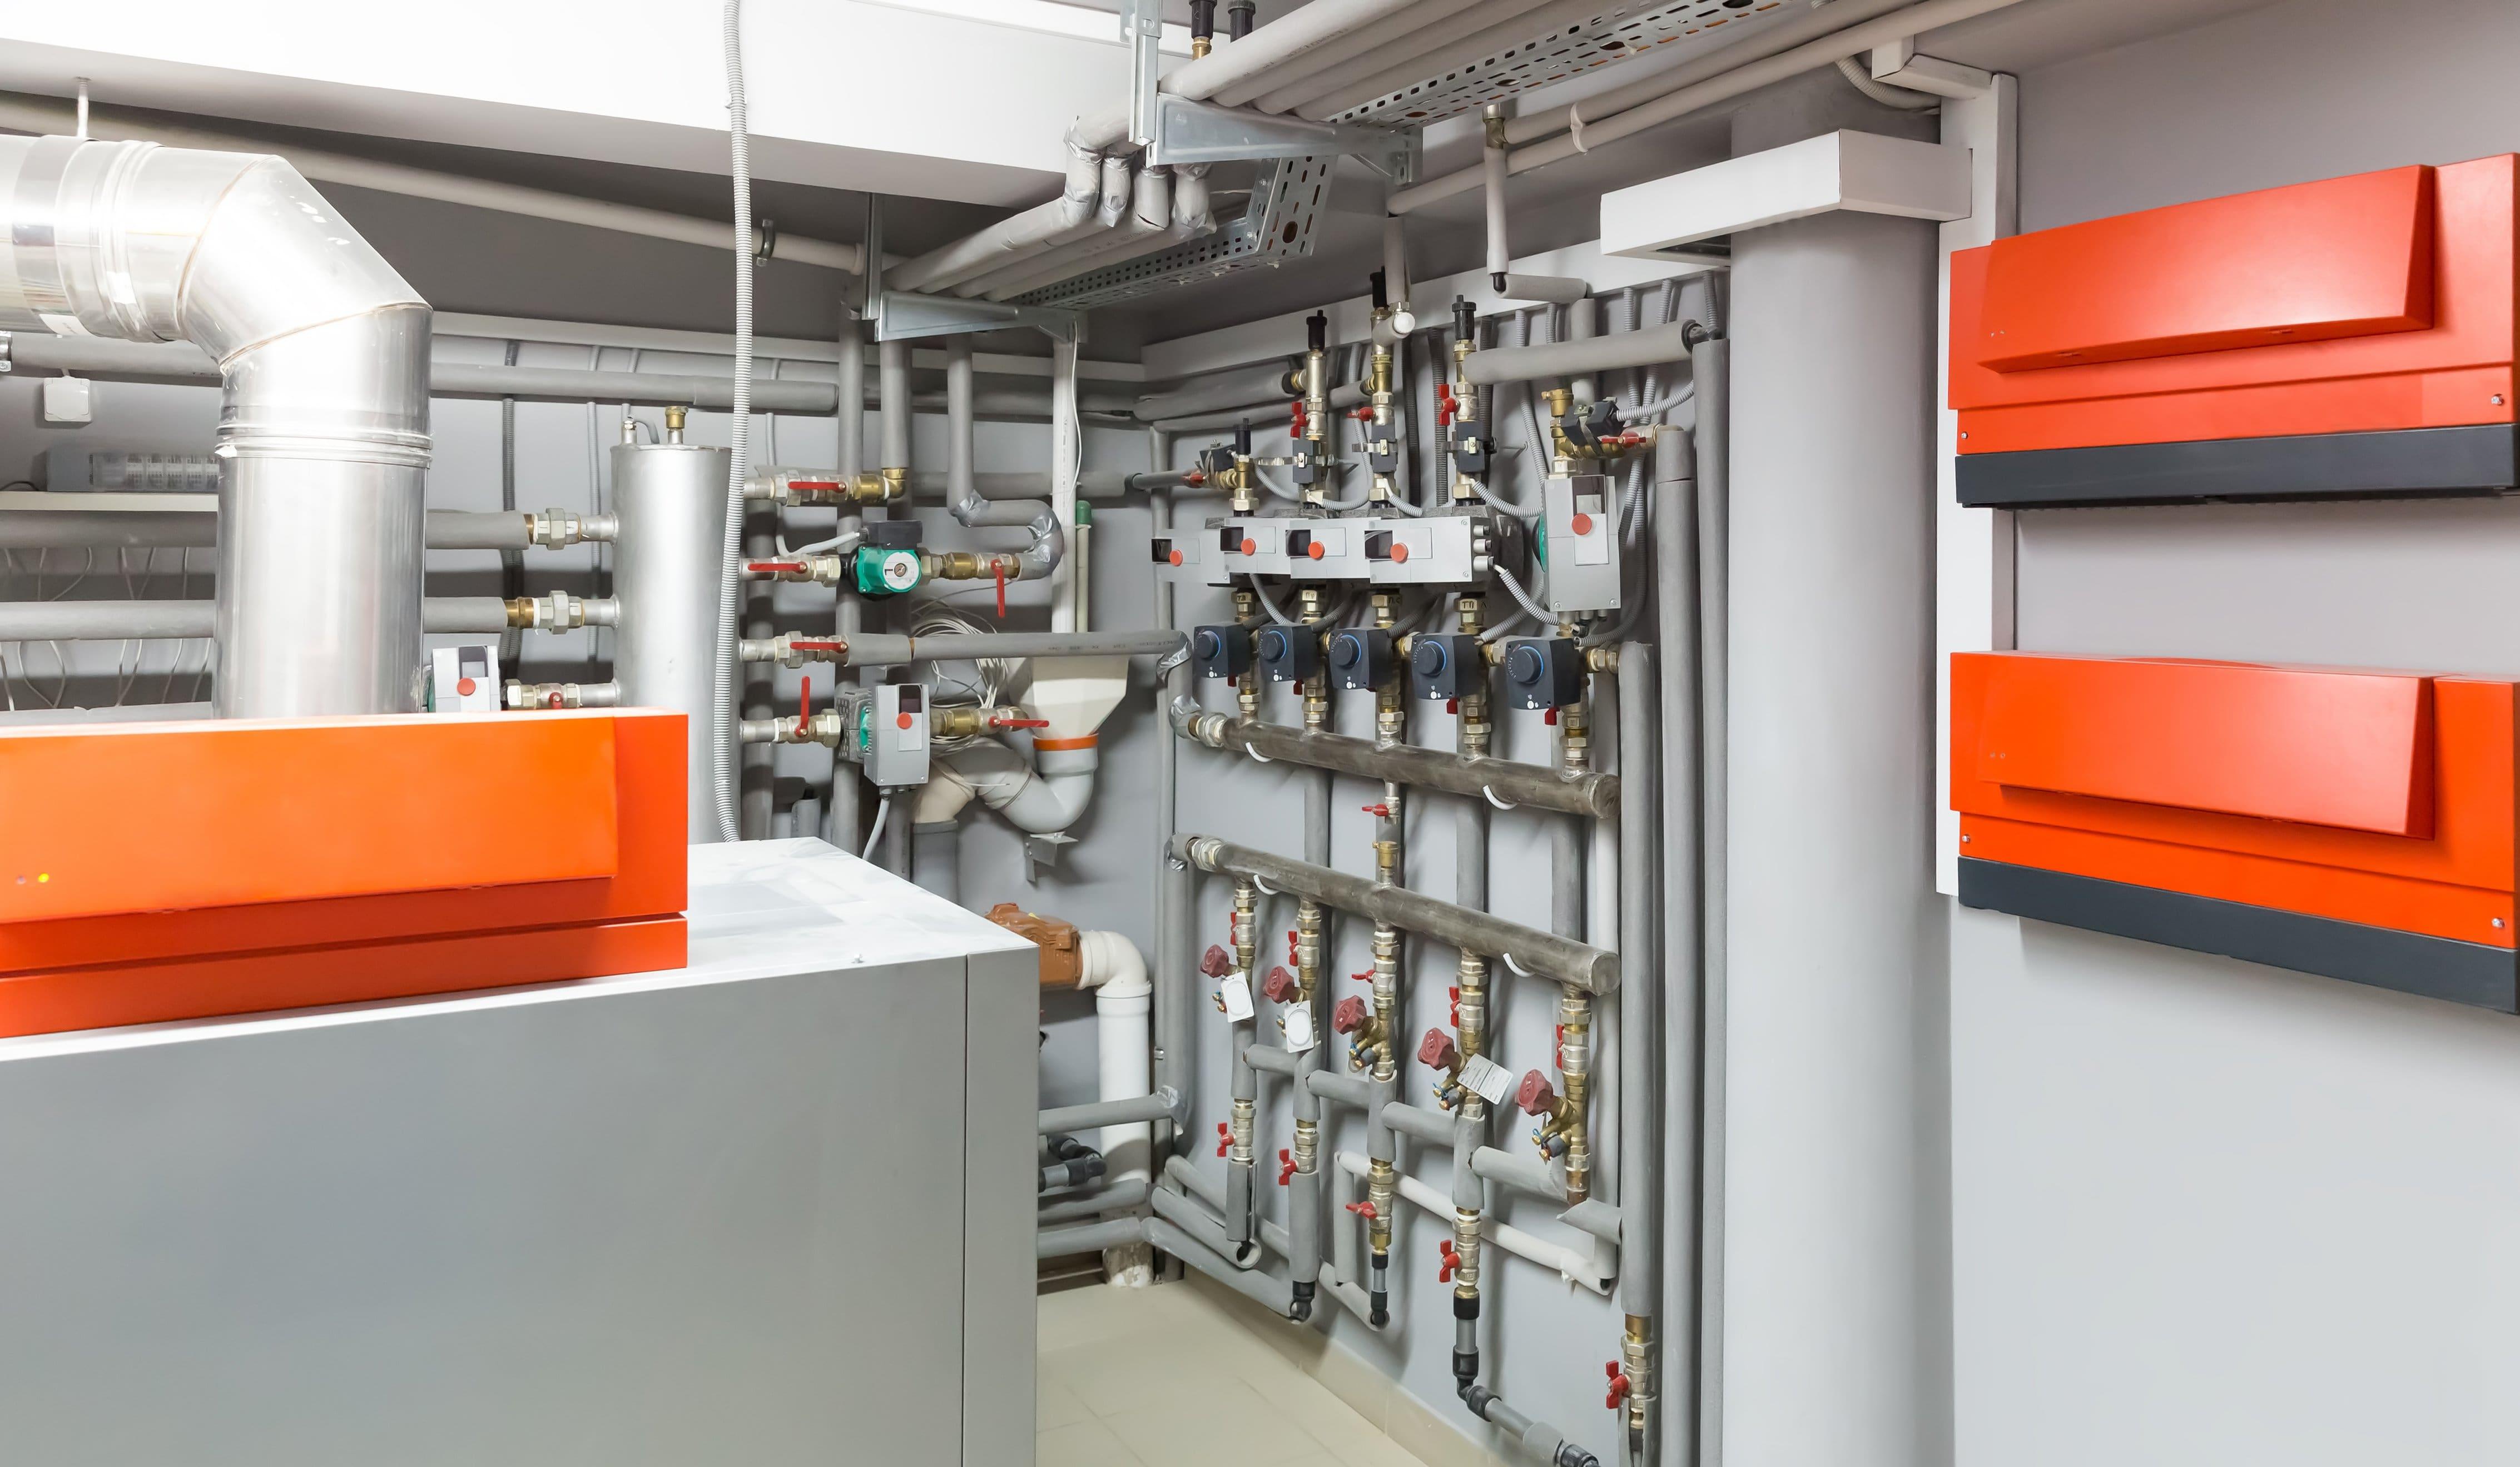 SS_Modern heating system